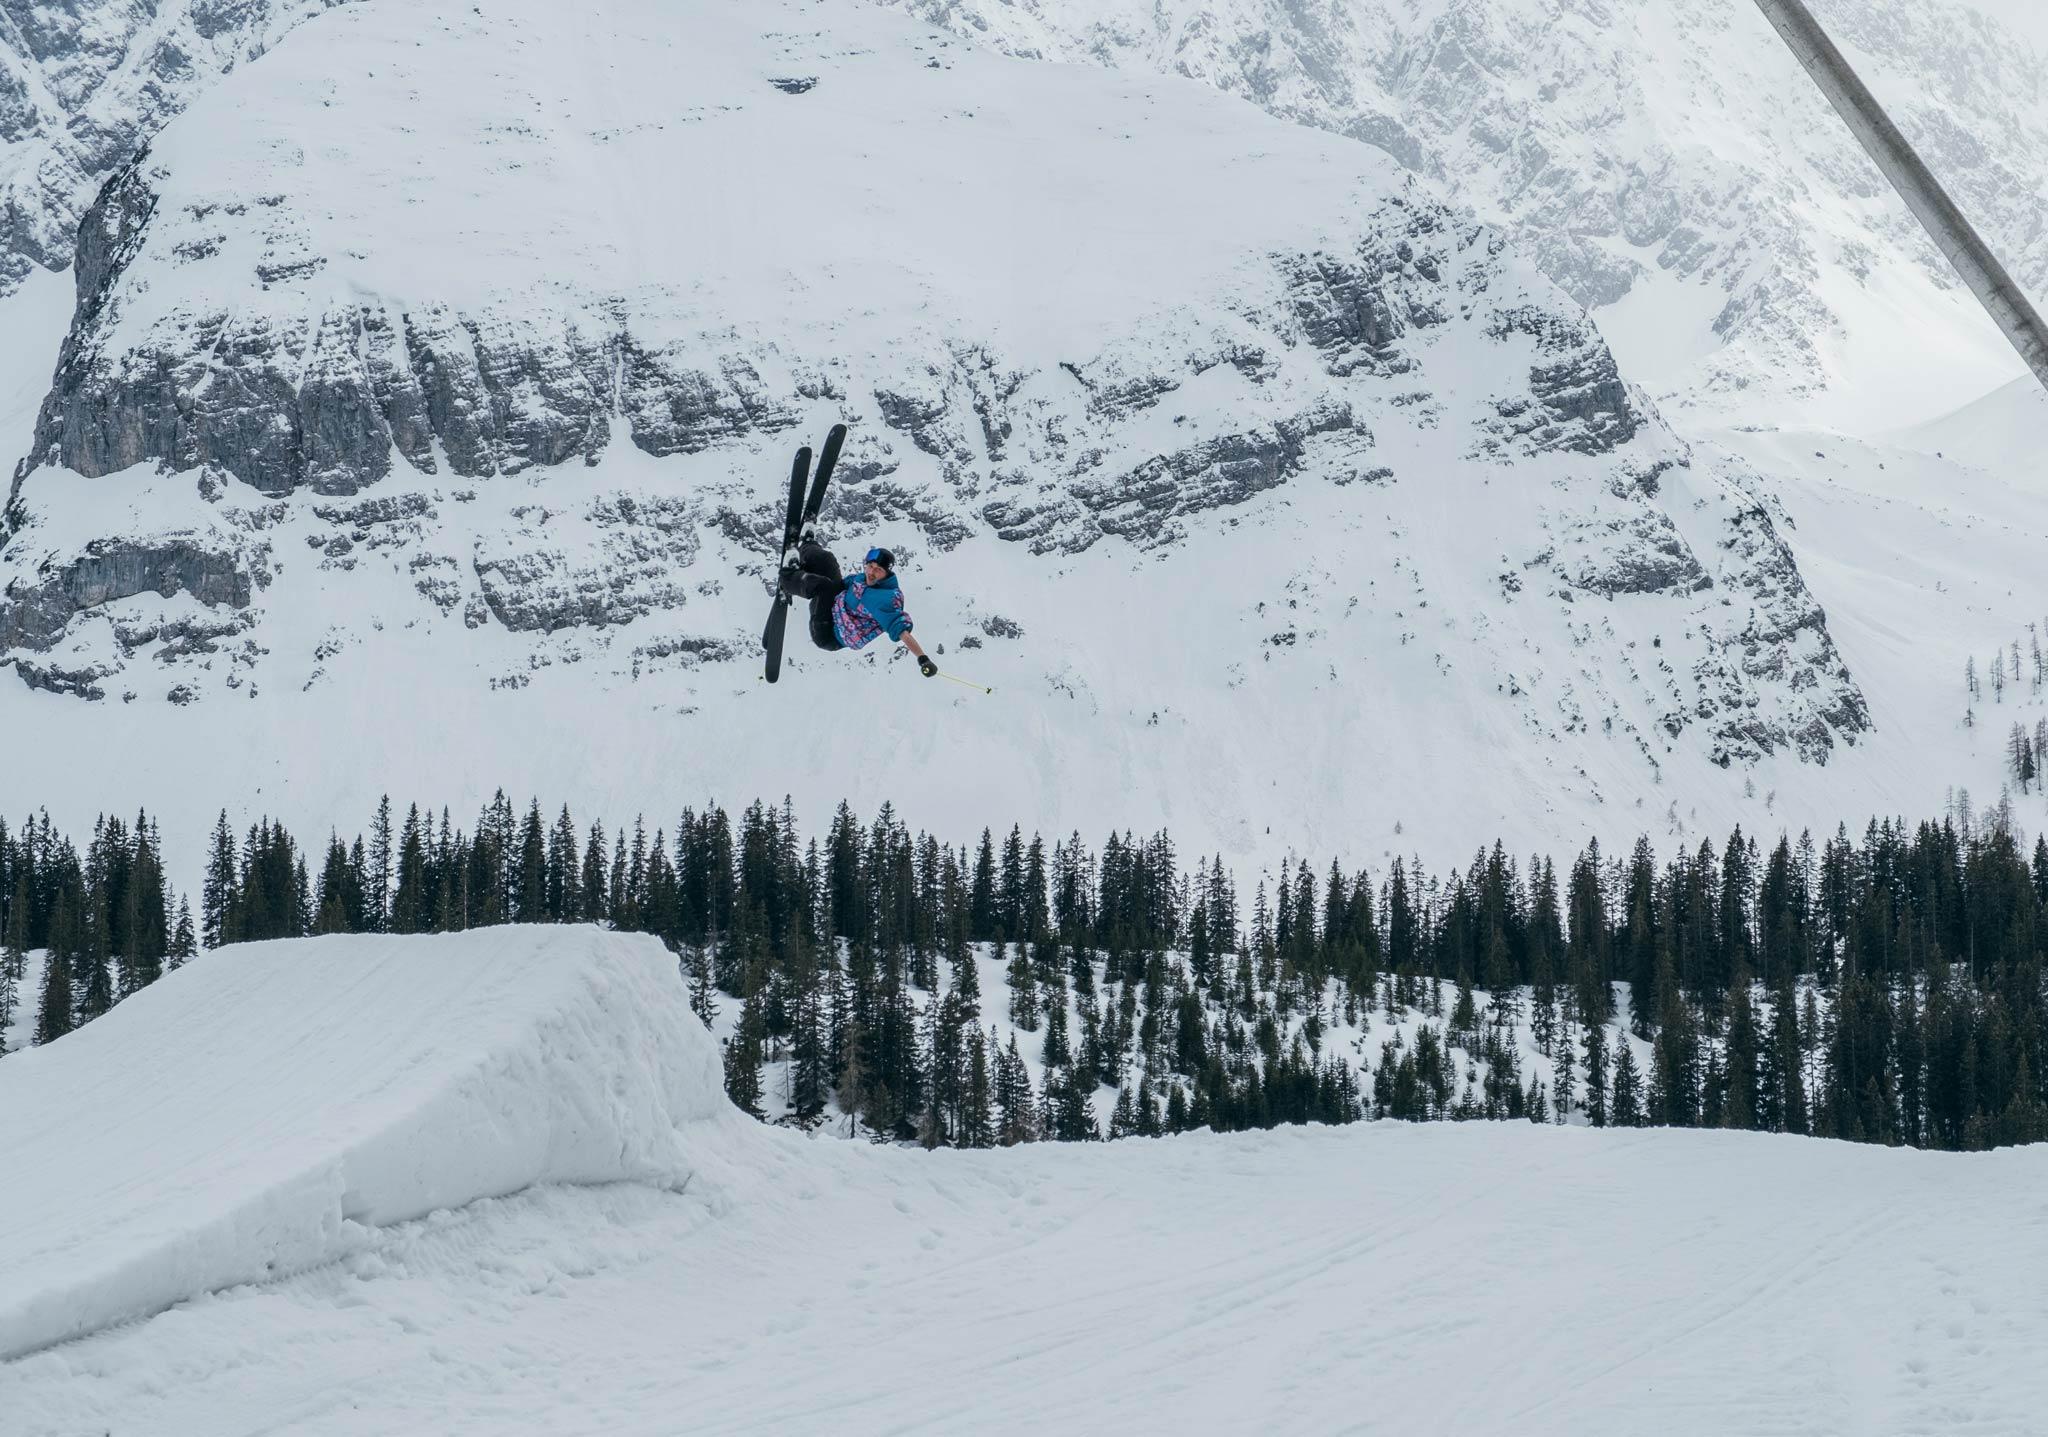 Rider: Paddy - Foto: Tom Kigle